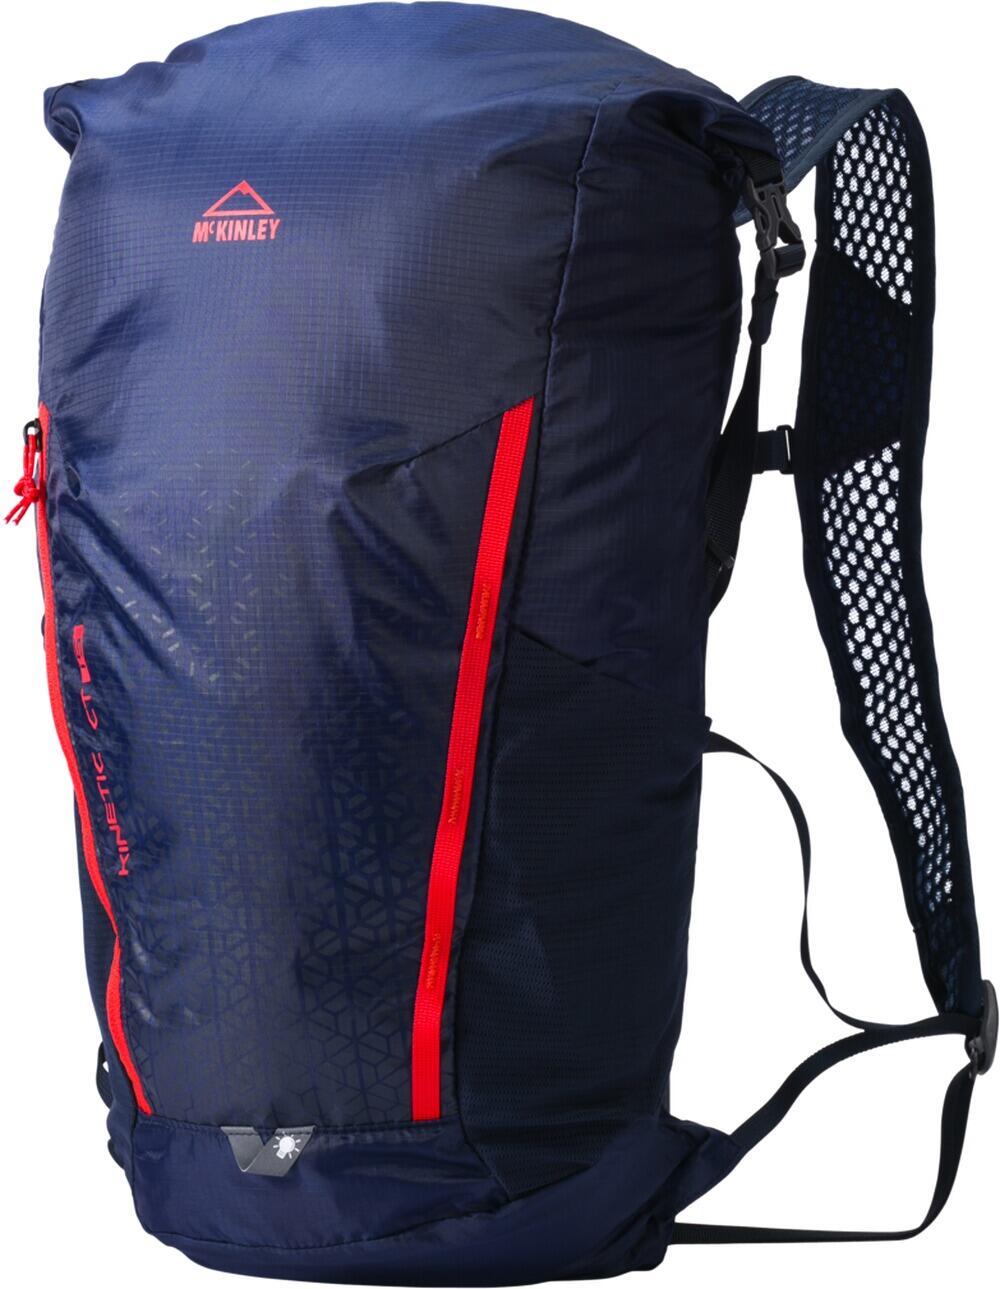 mckinley-kinetic-ct-15-rucksack-farbe-902-navy-blau-